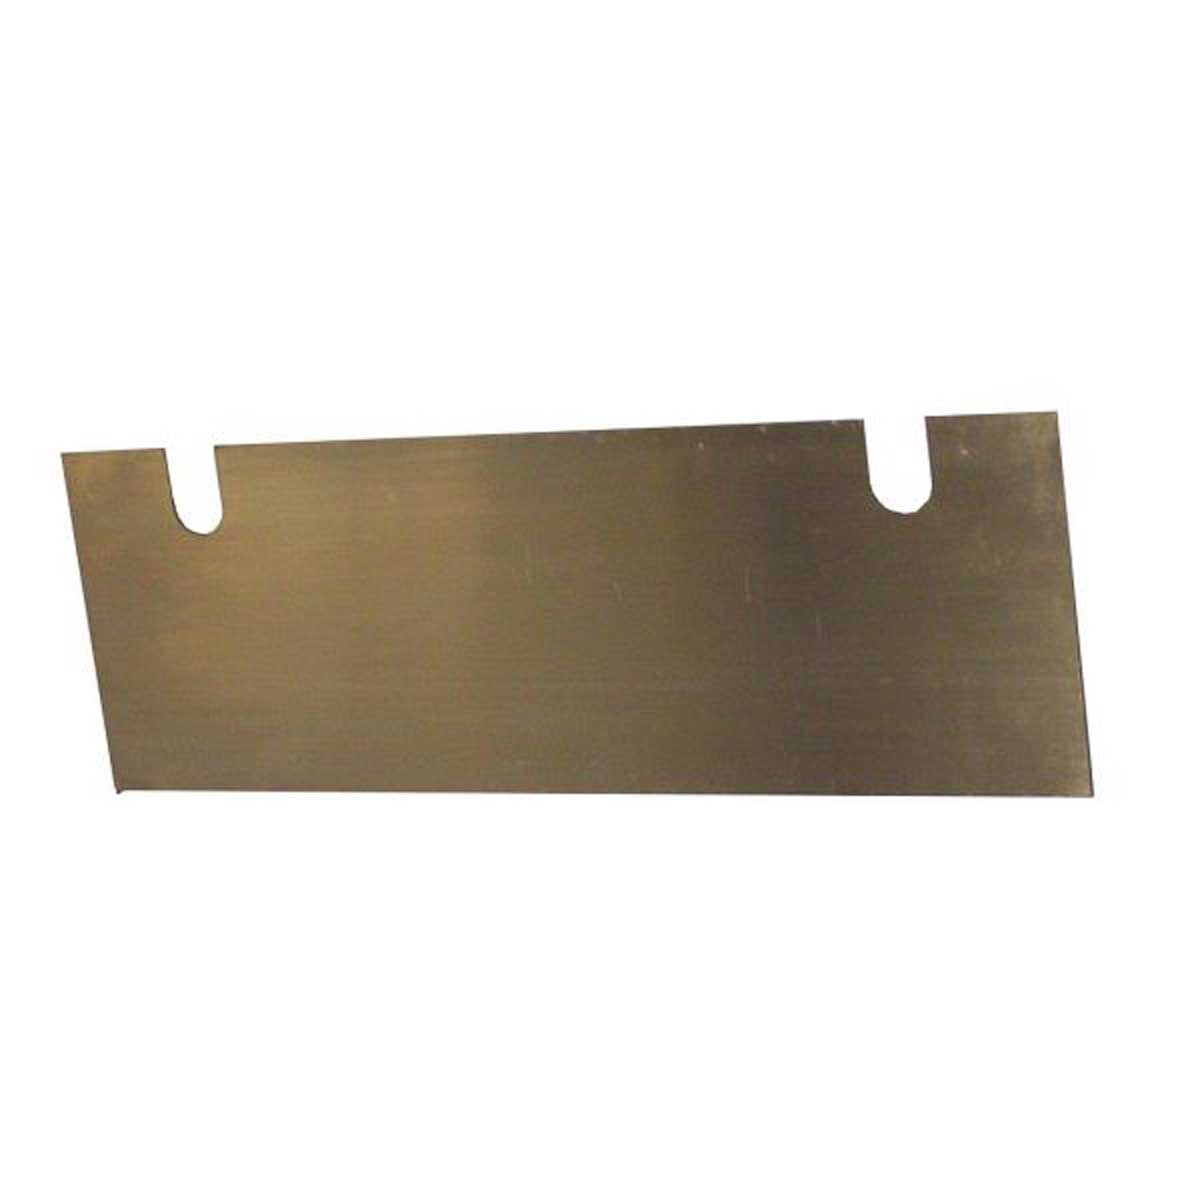 C301 Bartell Standard Blade MS230